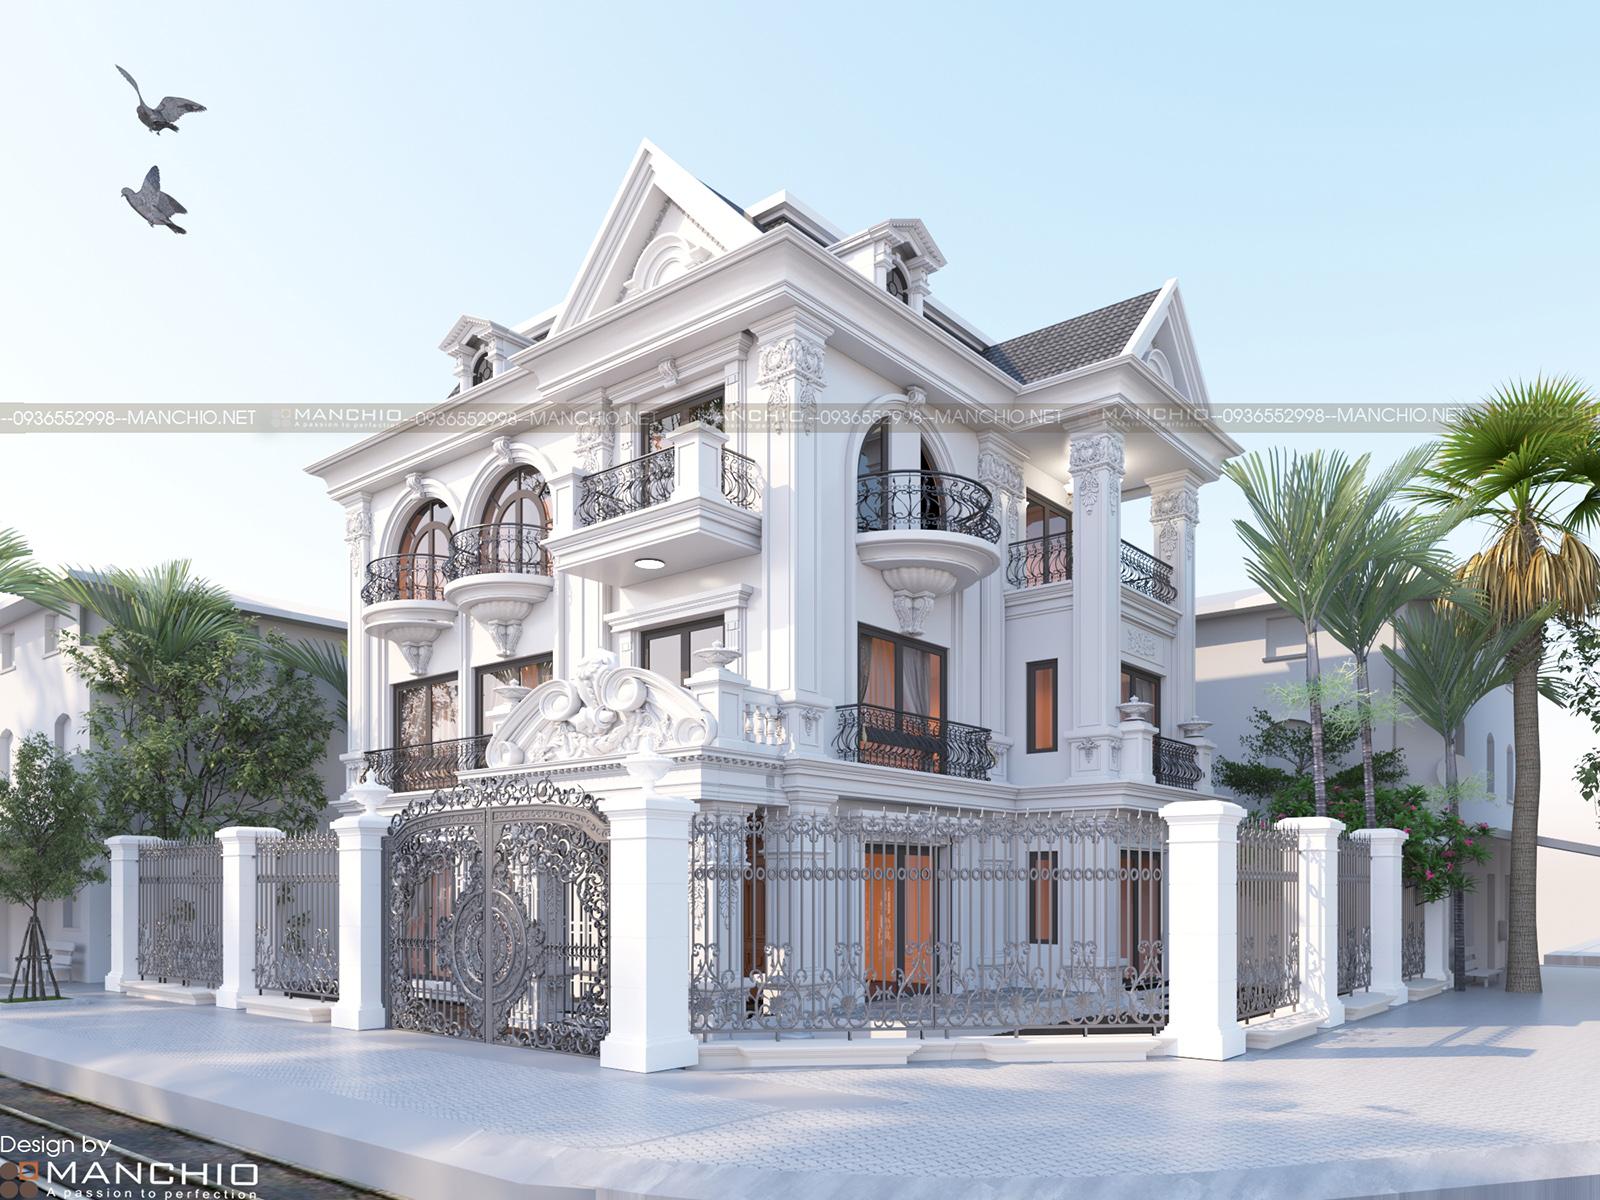 Thiết kế kiến trúc Biệt thự Harmony Vinhomes - Manchio.net